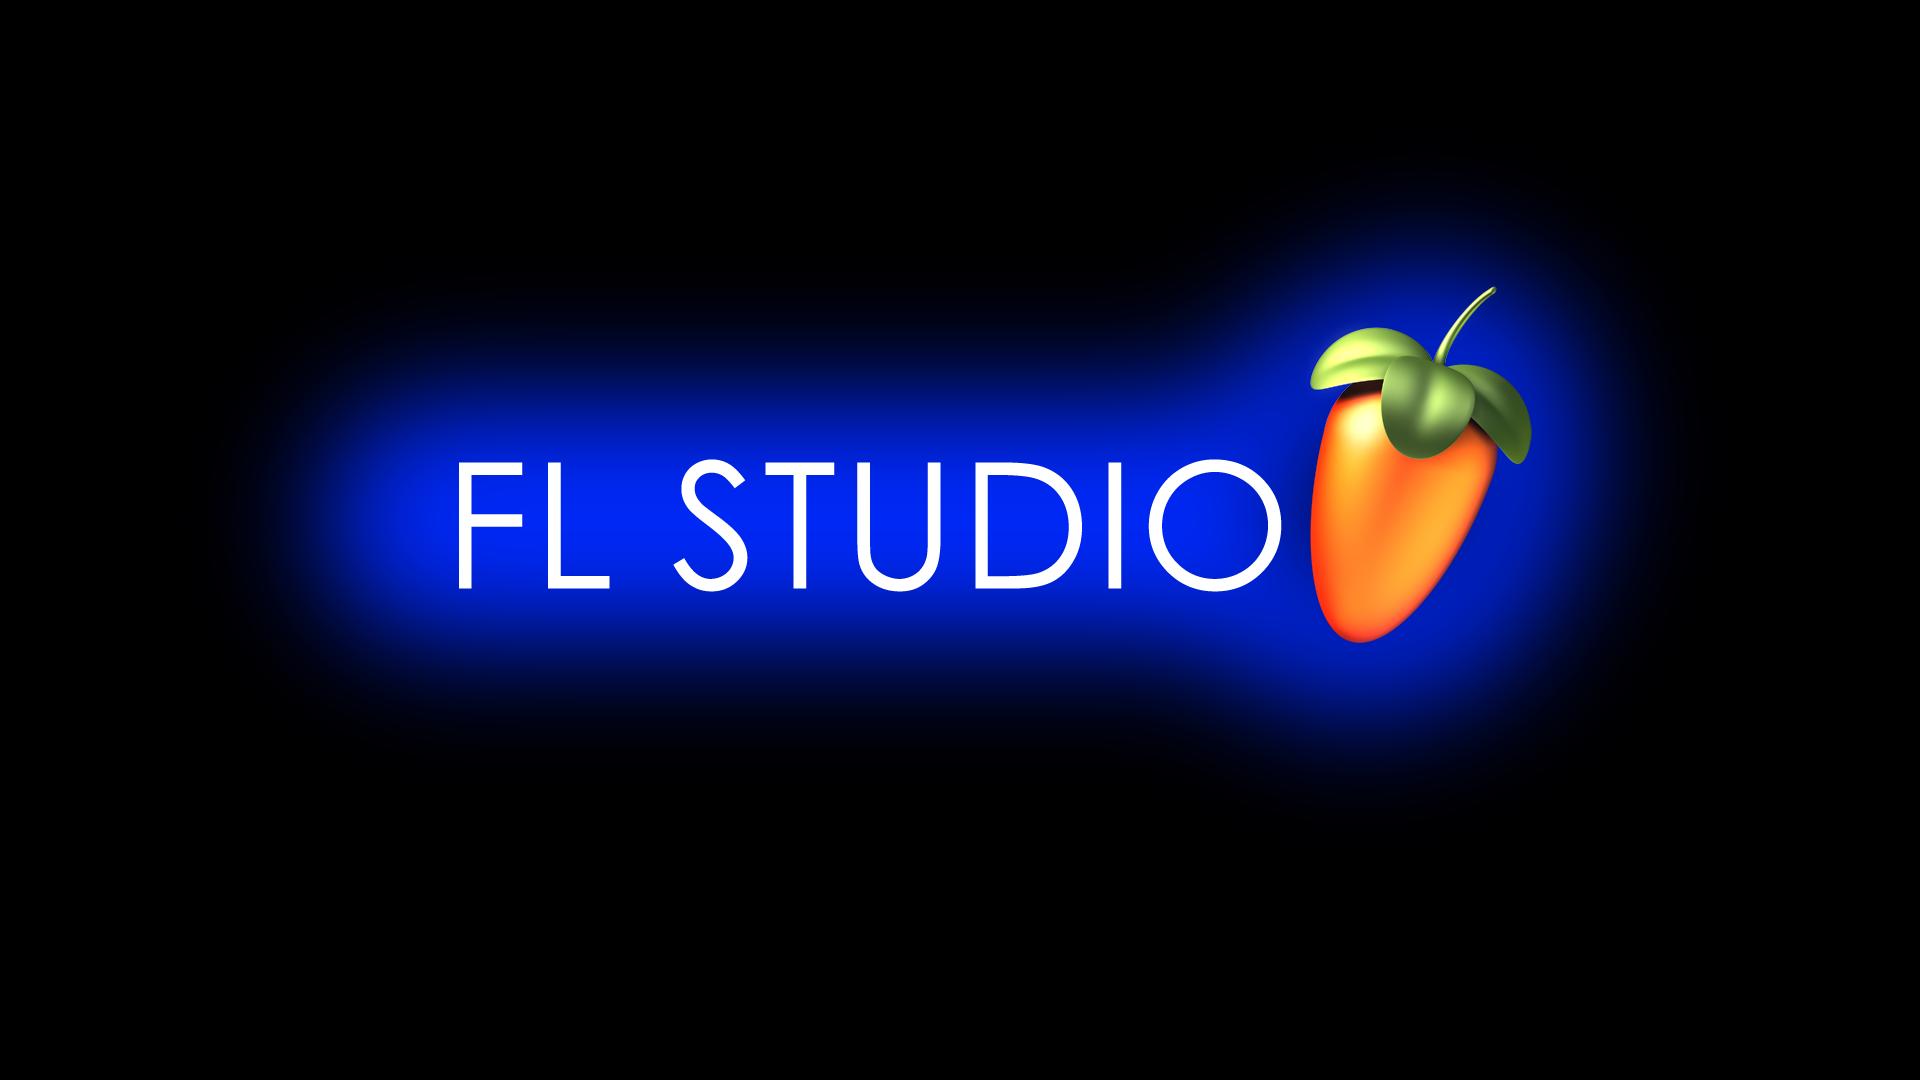 FL Studio 20.8.3.2293 Crack With Keygen And Torrent Full Download [New] 2021